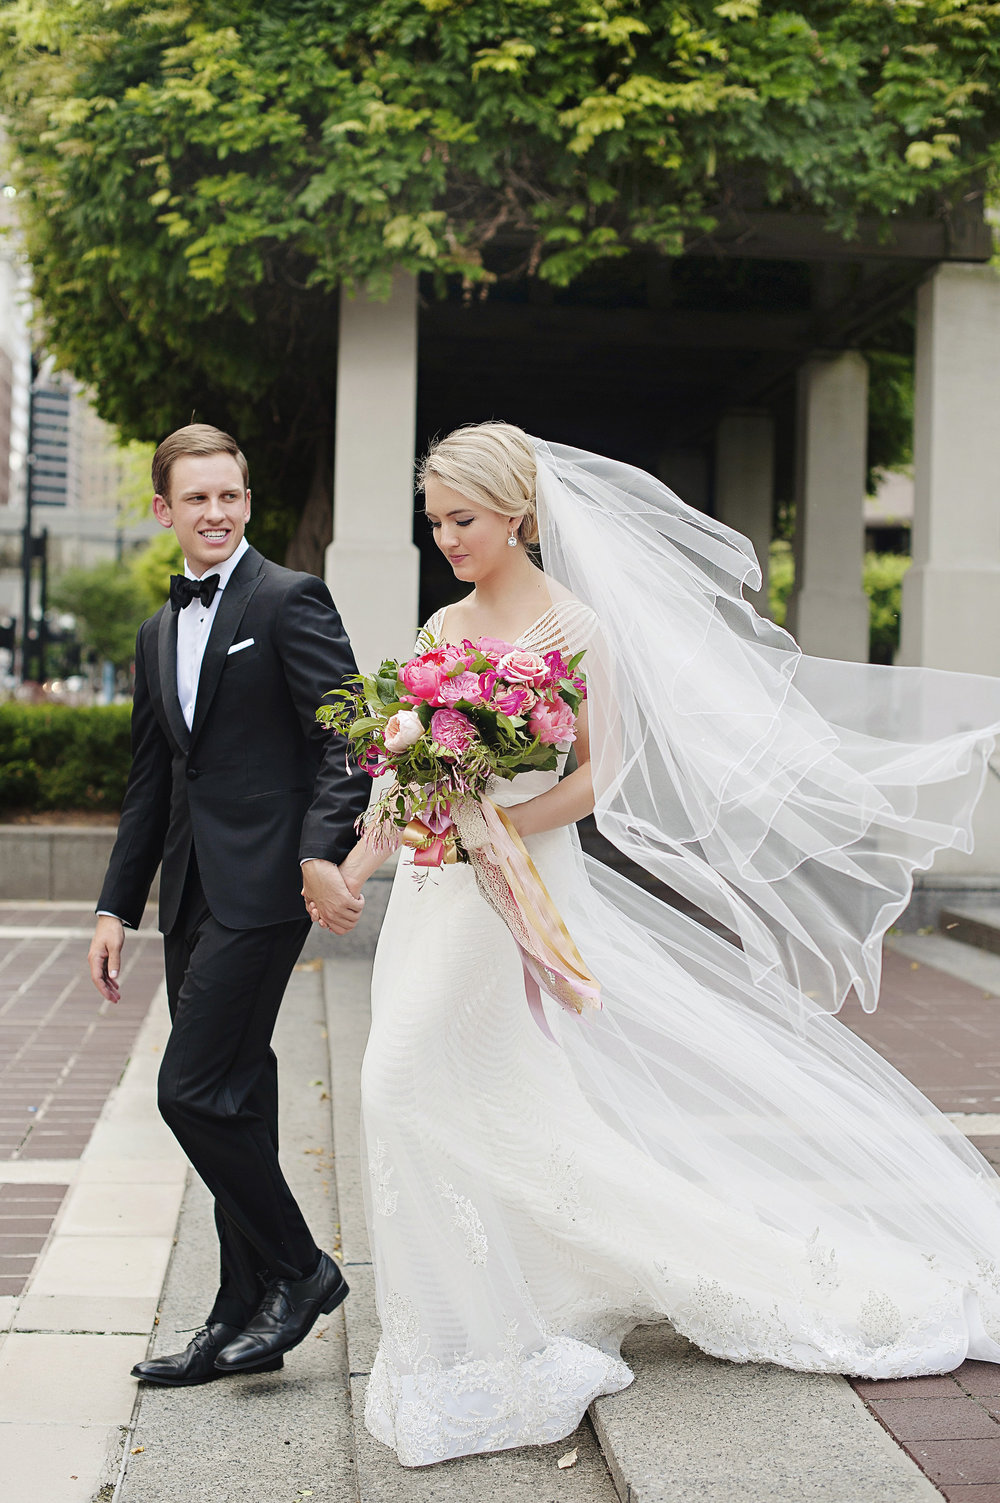 Bride and Groom Wedding shots at Hilton Netherland Plaza